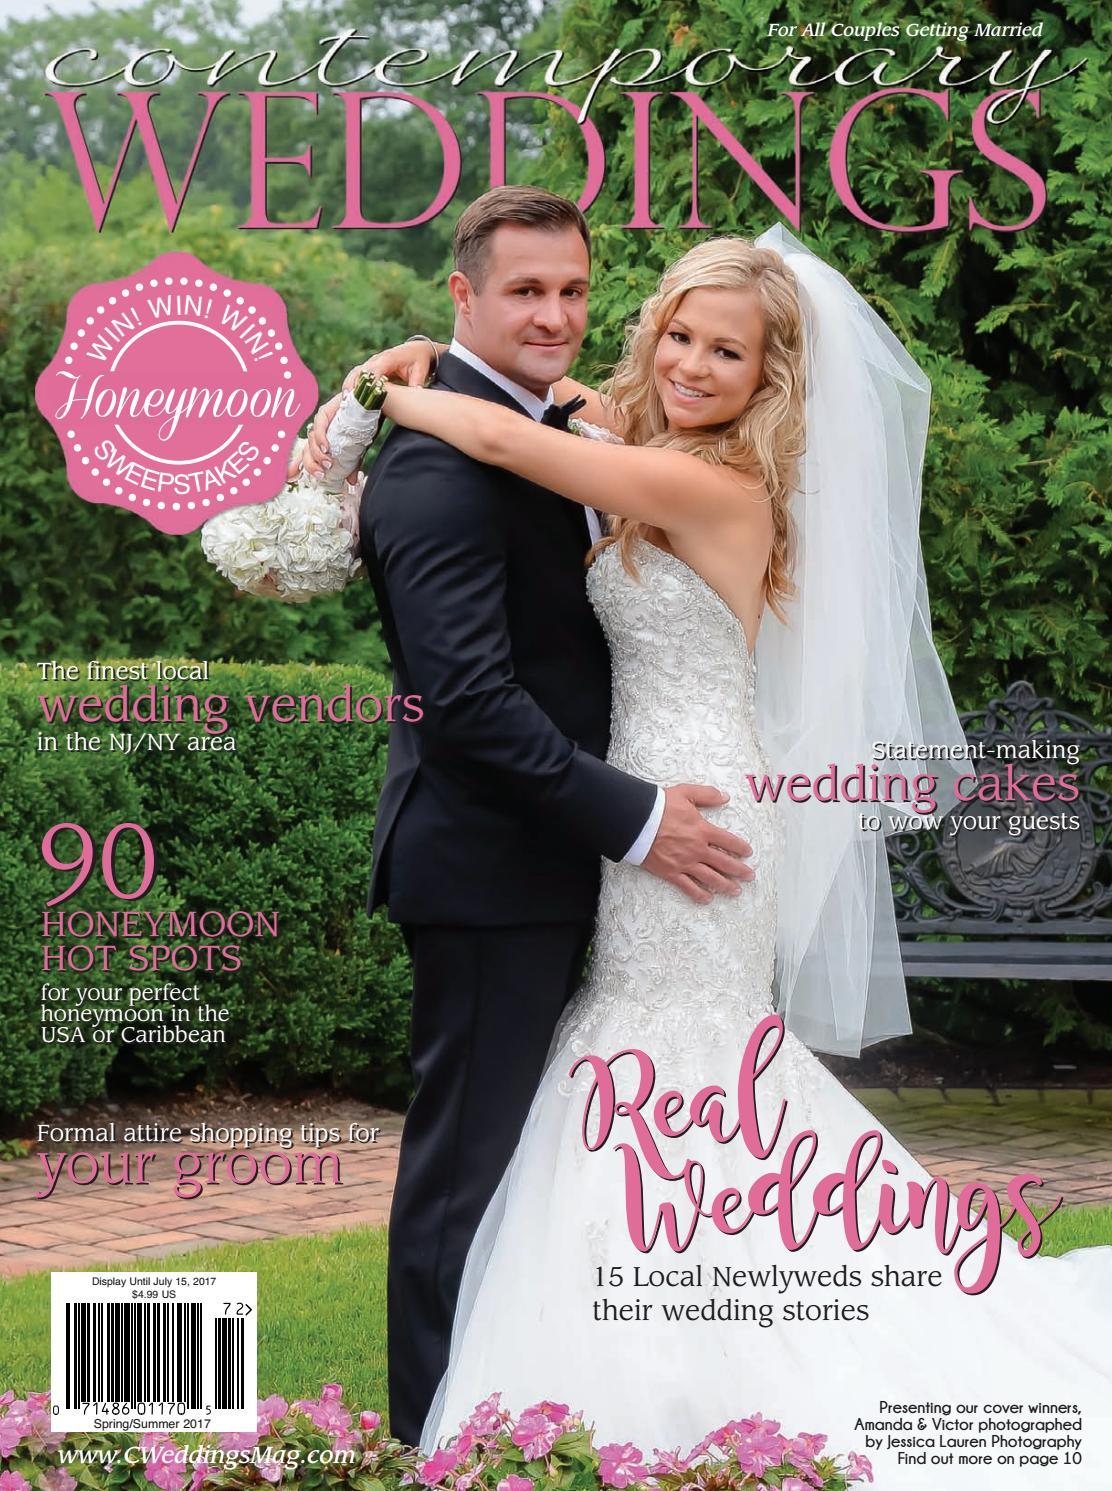 Contemporary Weddings Magazine - Spring Summer 2017 New Jersey Edition ac50f36059e0